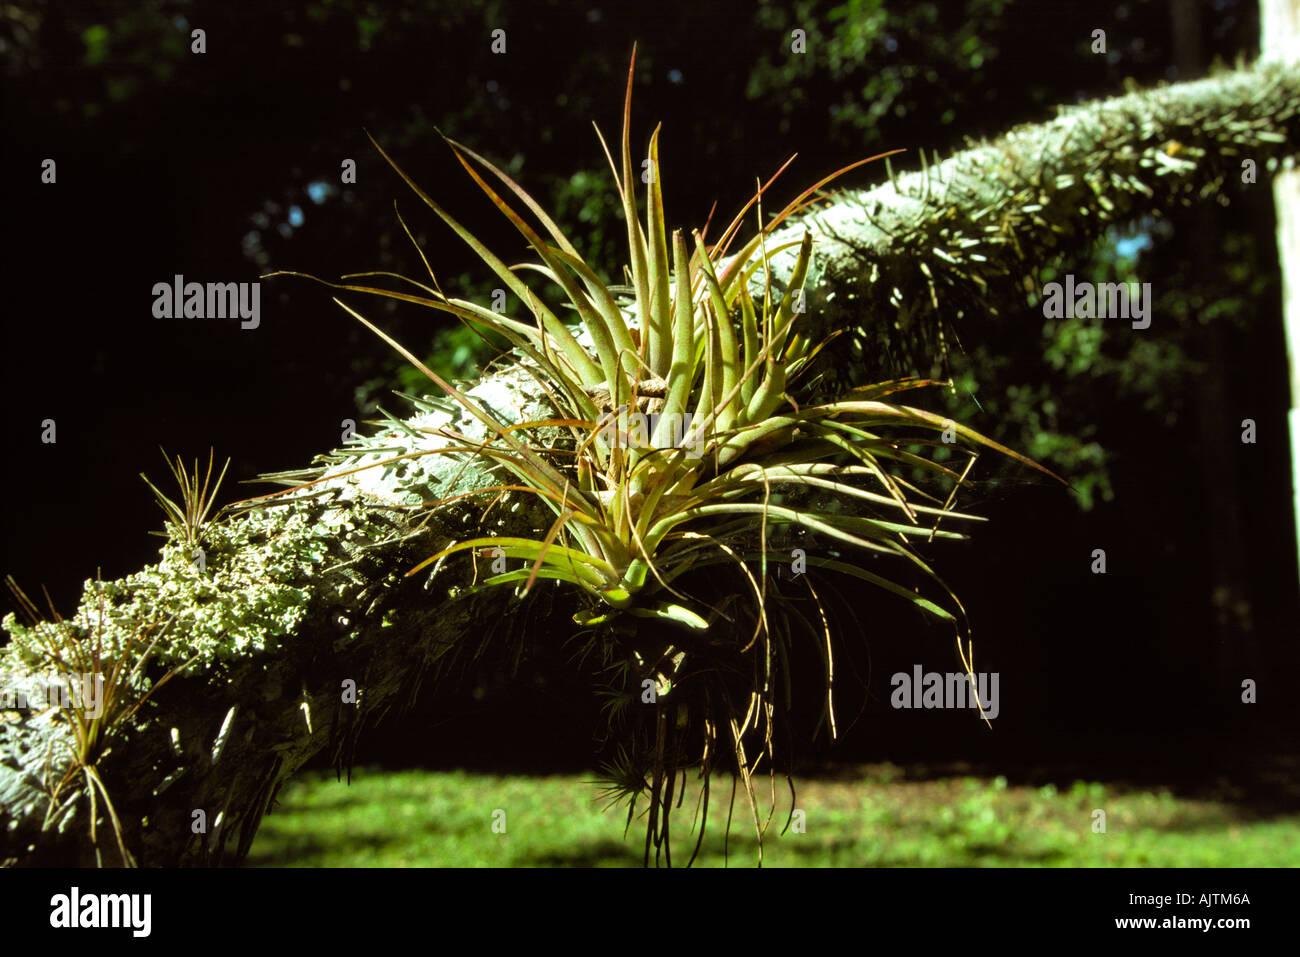 Guatemala Peten Flora Tillandsia Ionantha Air Plant On Branch Of